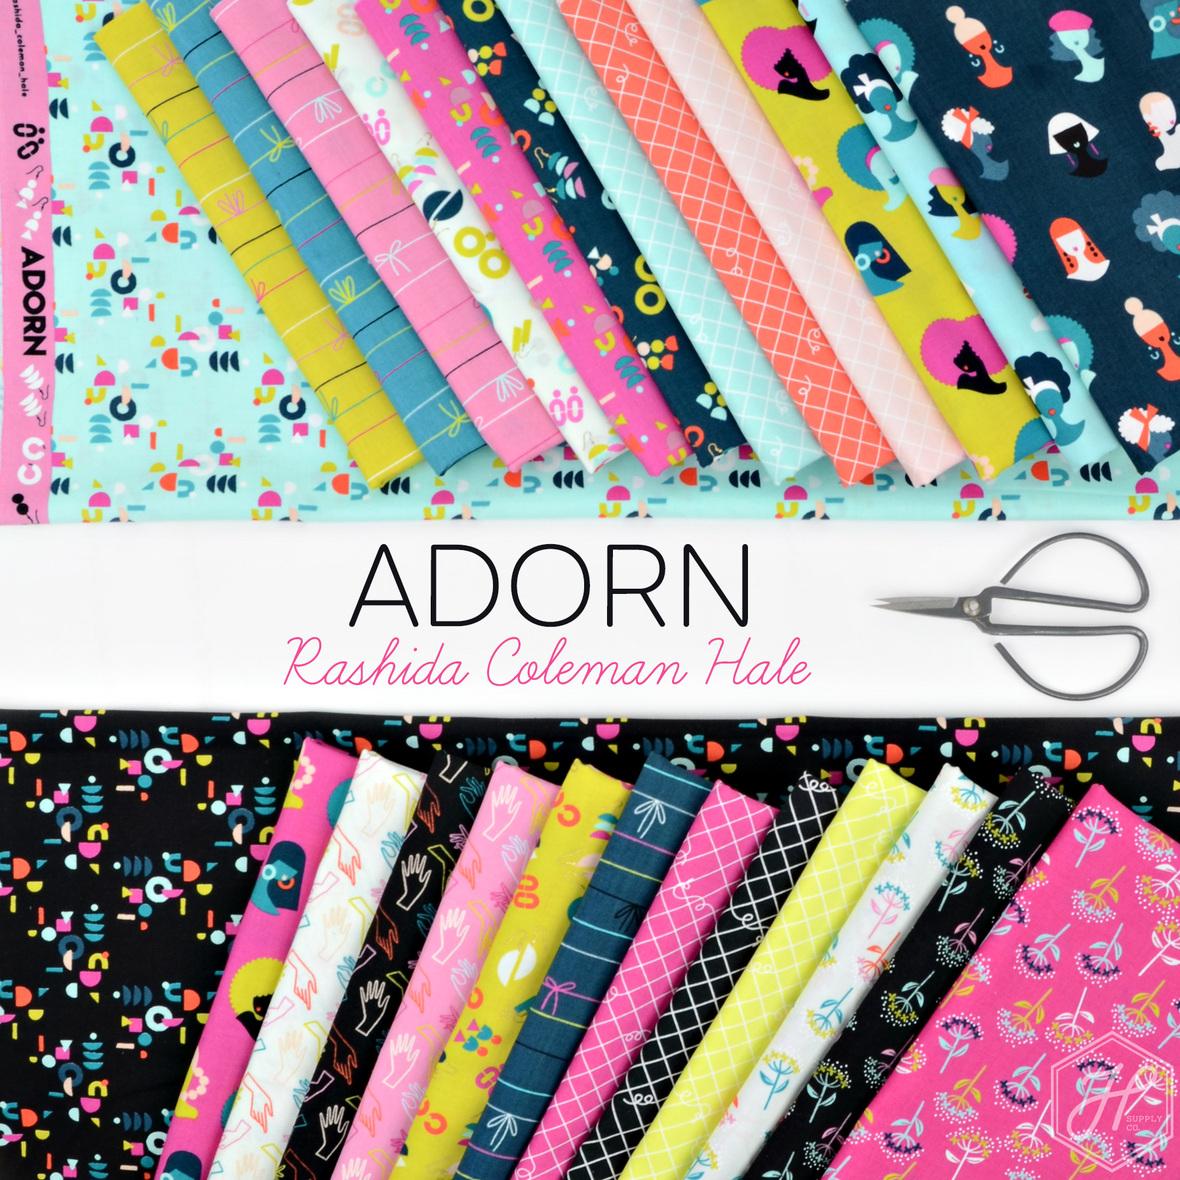 Adorn-fabric-Rashida-Coleman-Hale-for-Ruby-Star-Society-at-Hawthorne-Supply-Co